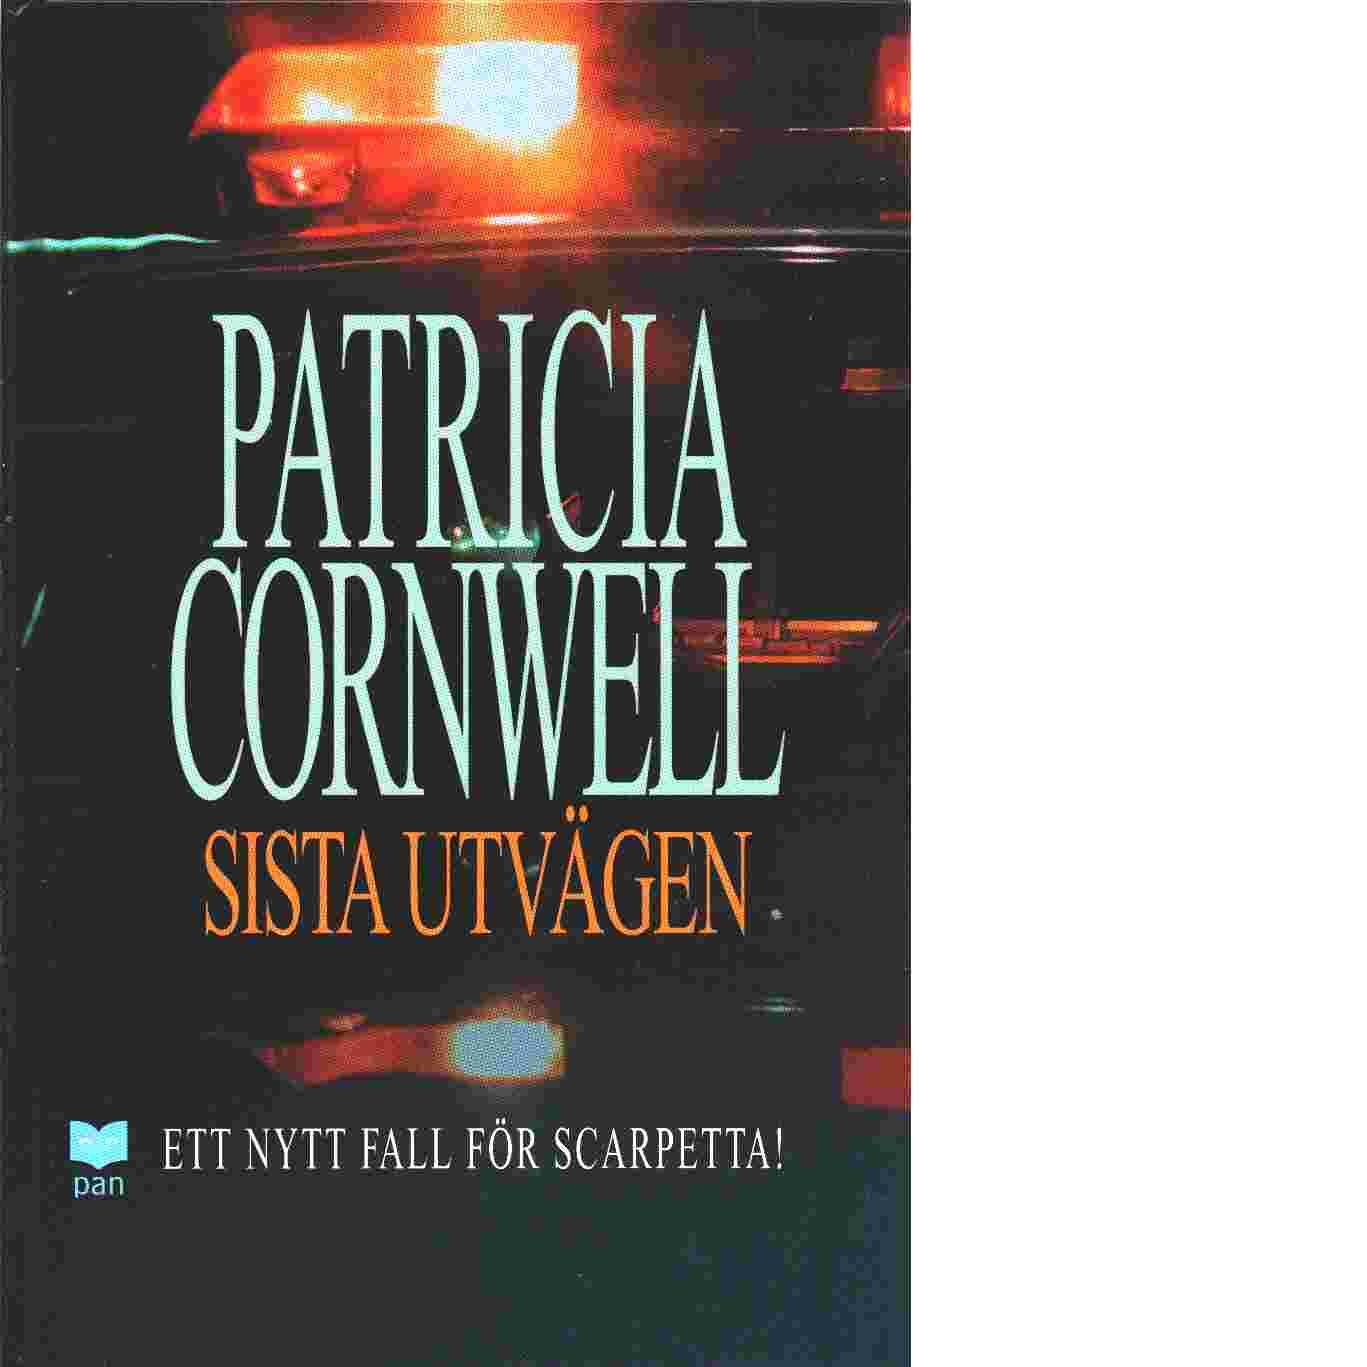 Sista utvägen - Cornwell, Patricia D.